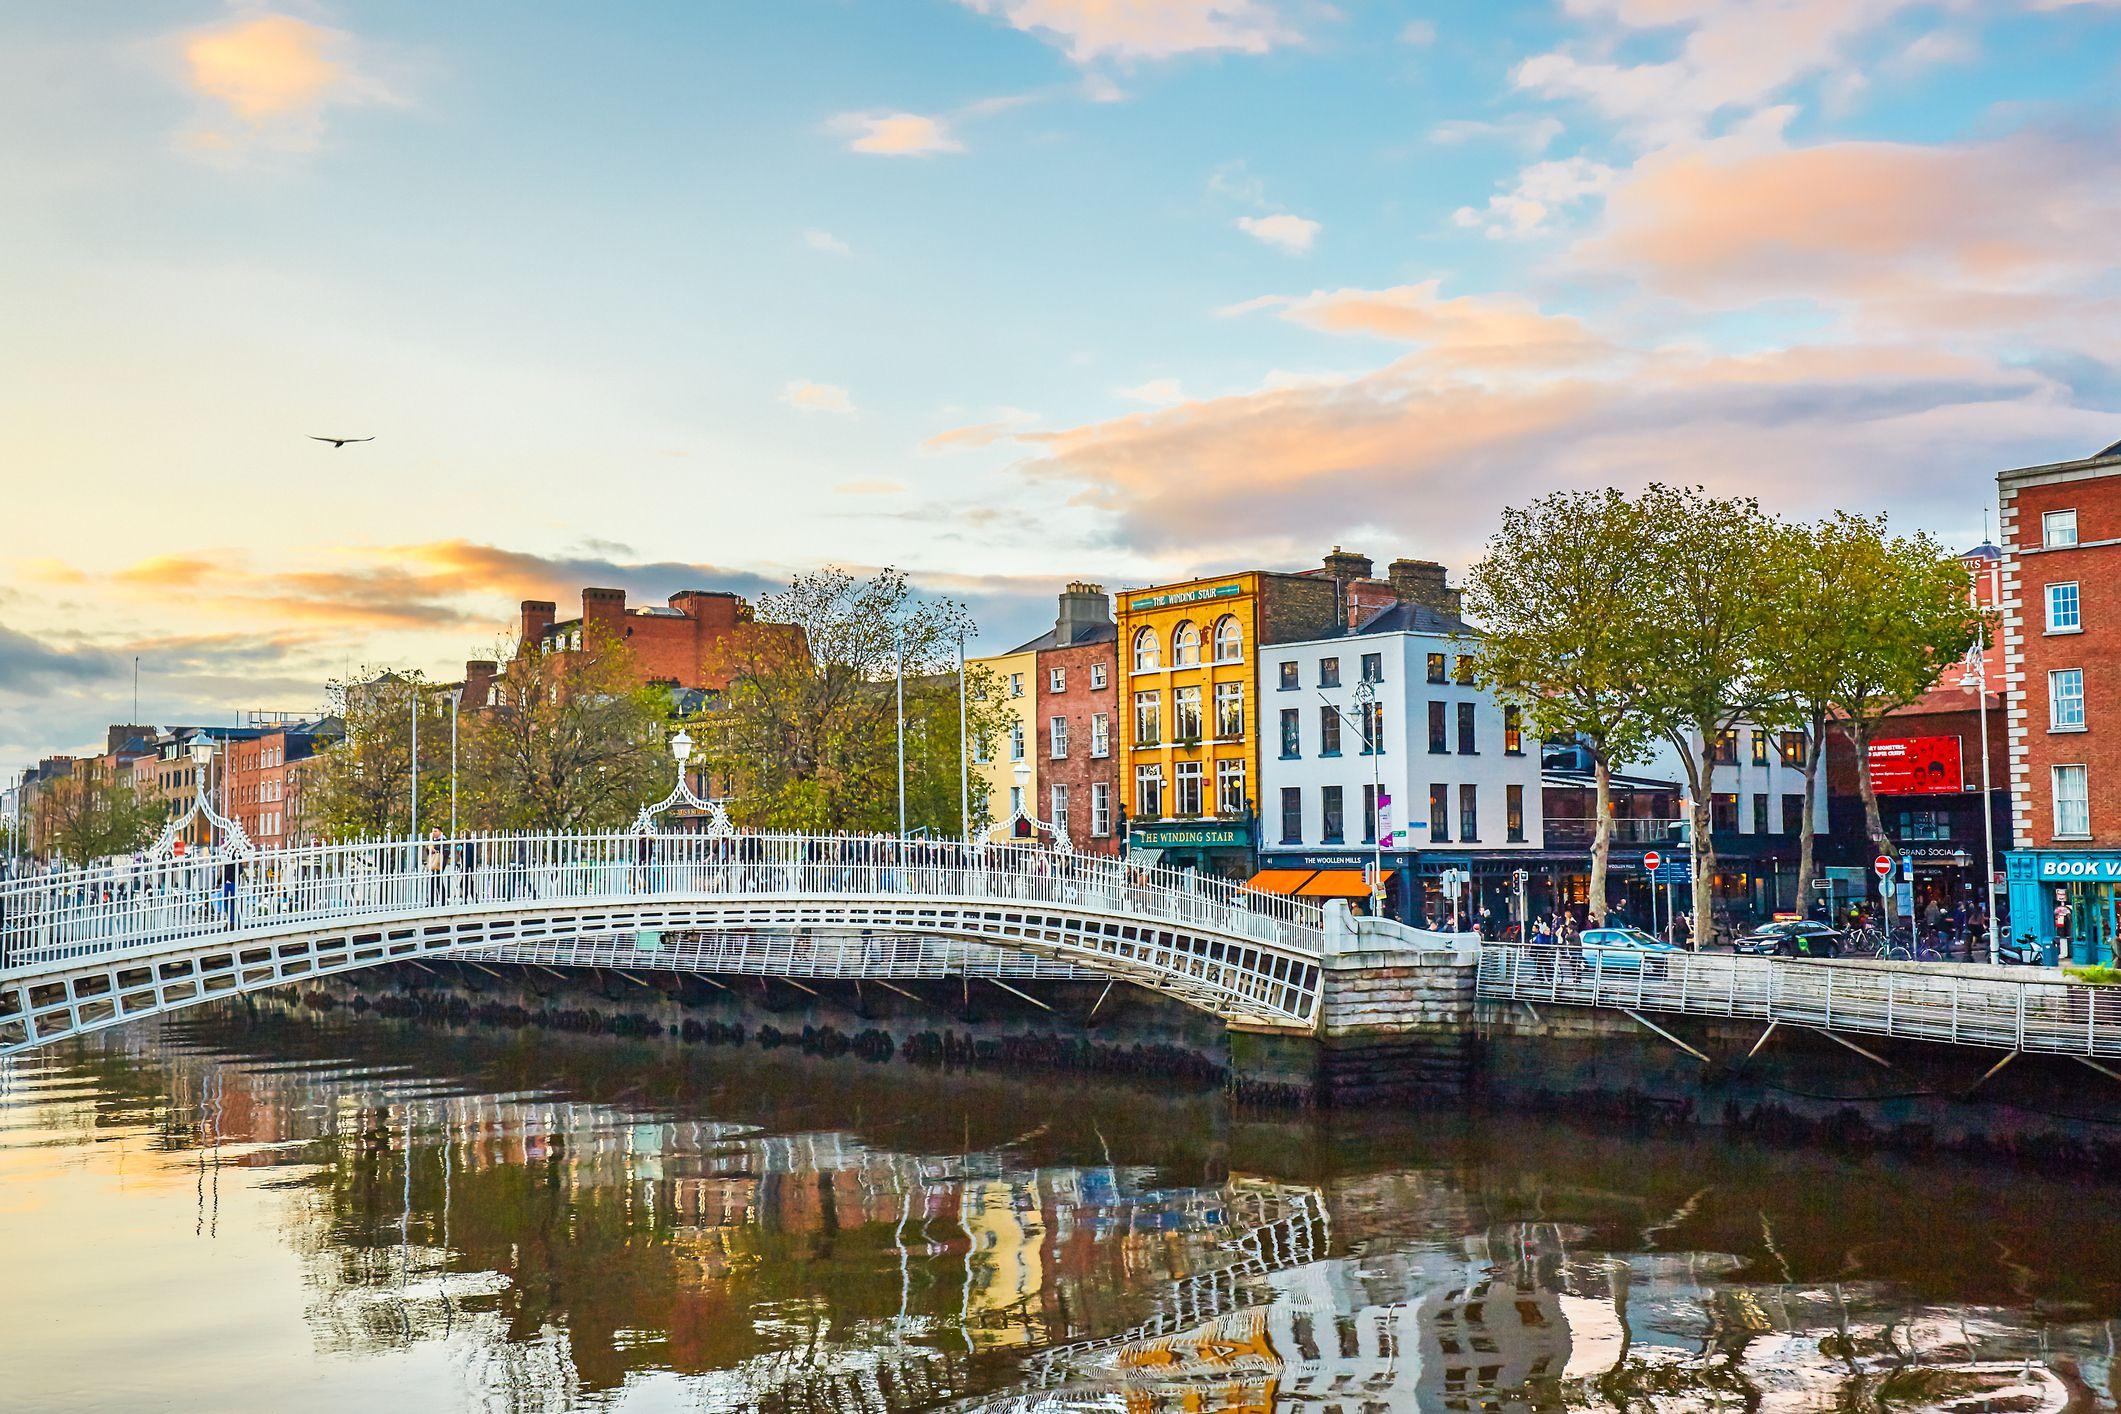 Kells - Discover Ireland